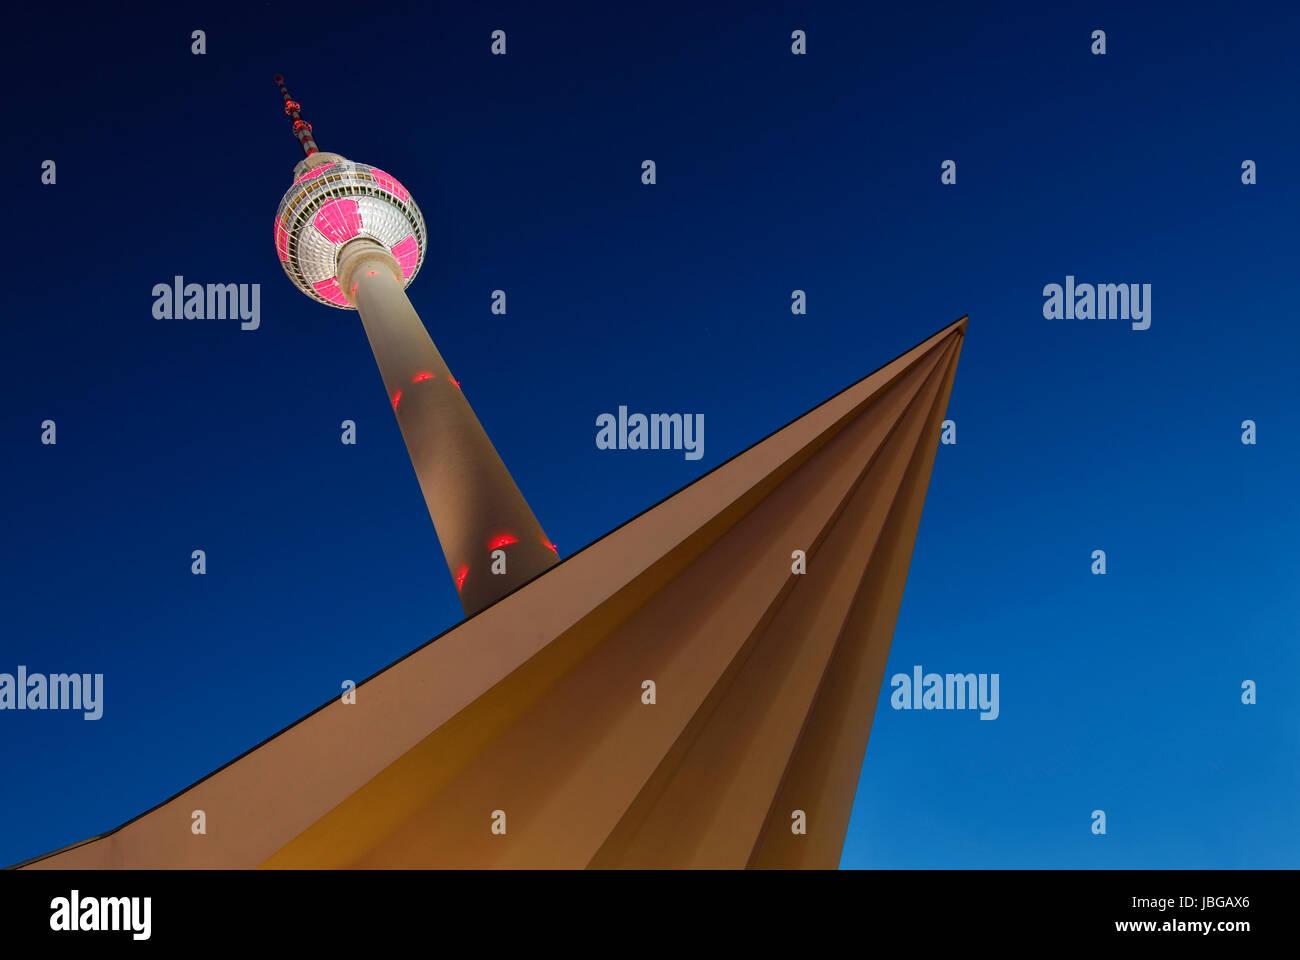 berlin tv tower at night - Stock Image